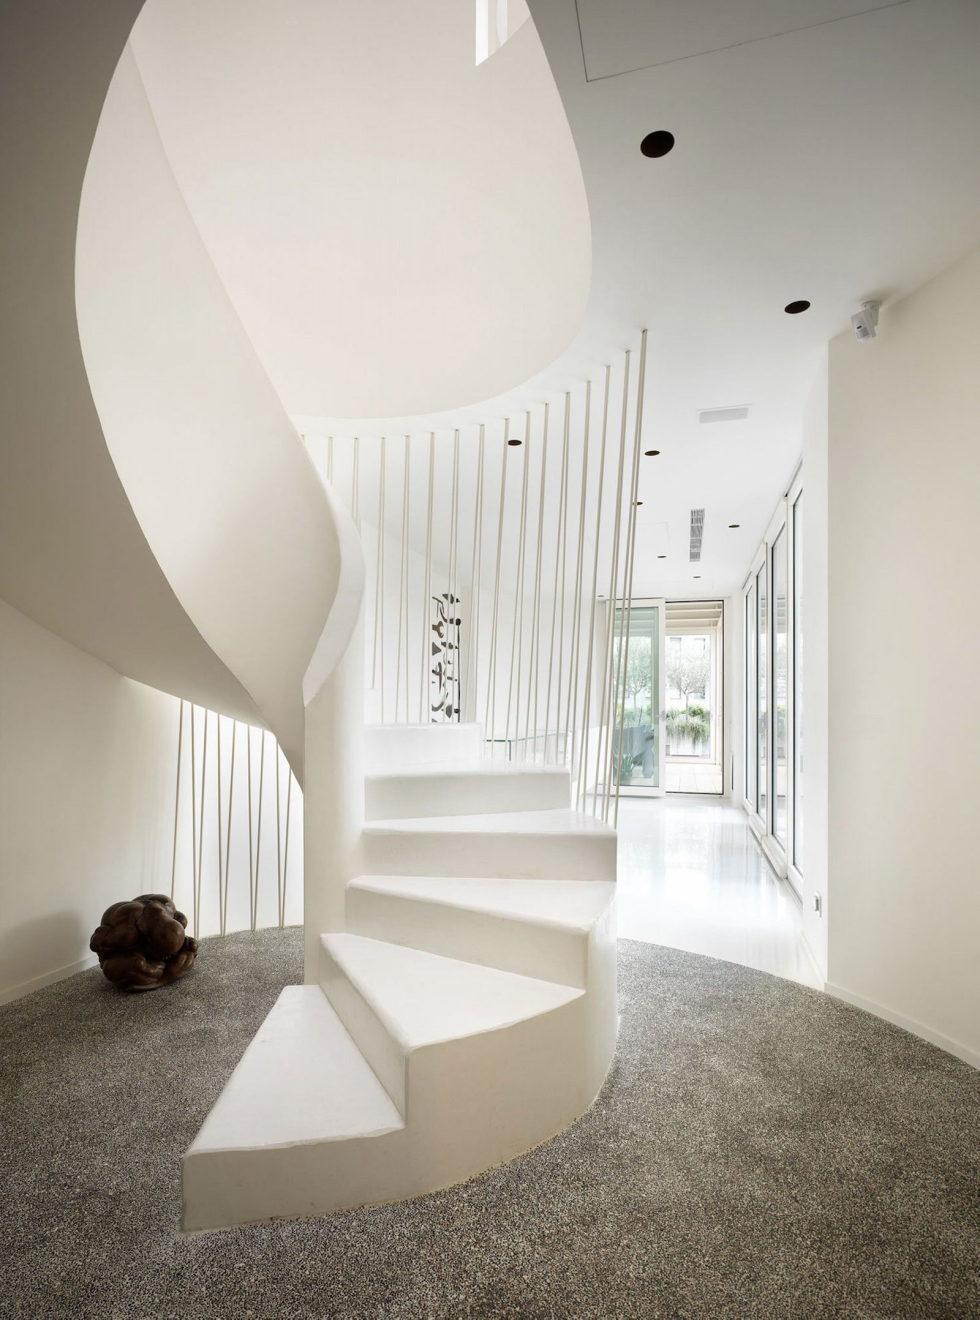 Three-level Apartments In Milan From Arassociati Architetti 8